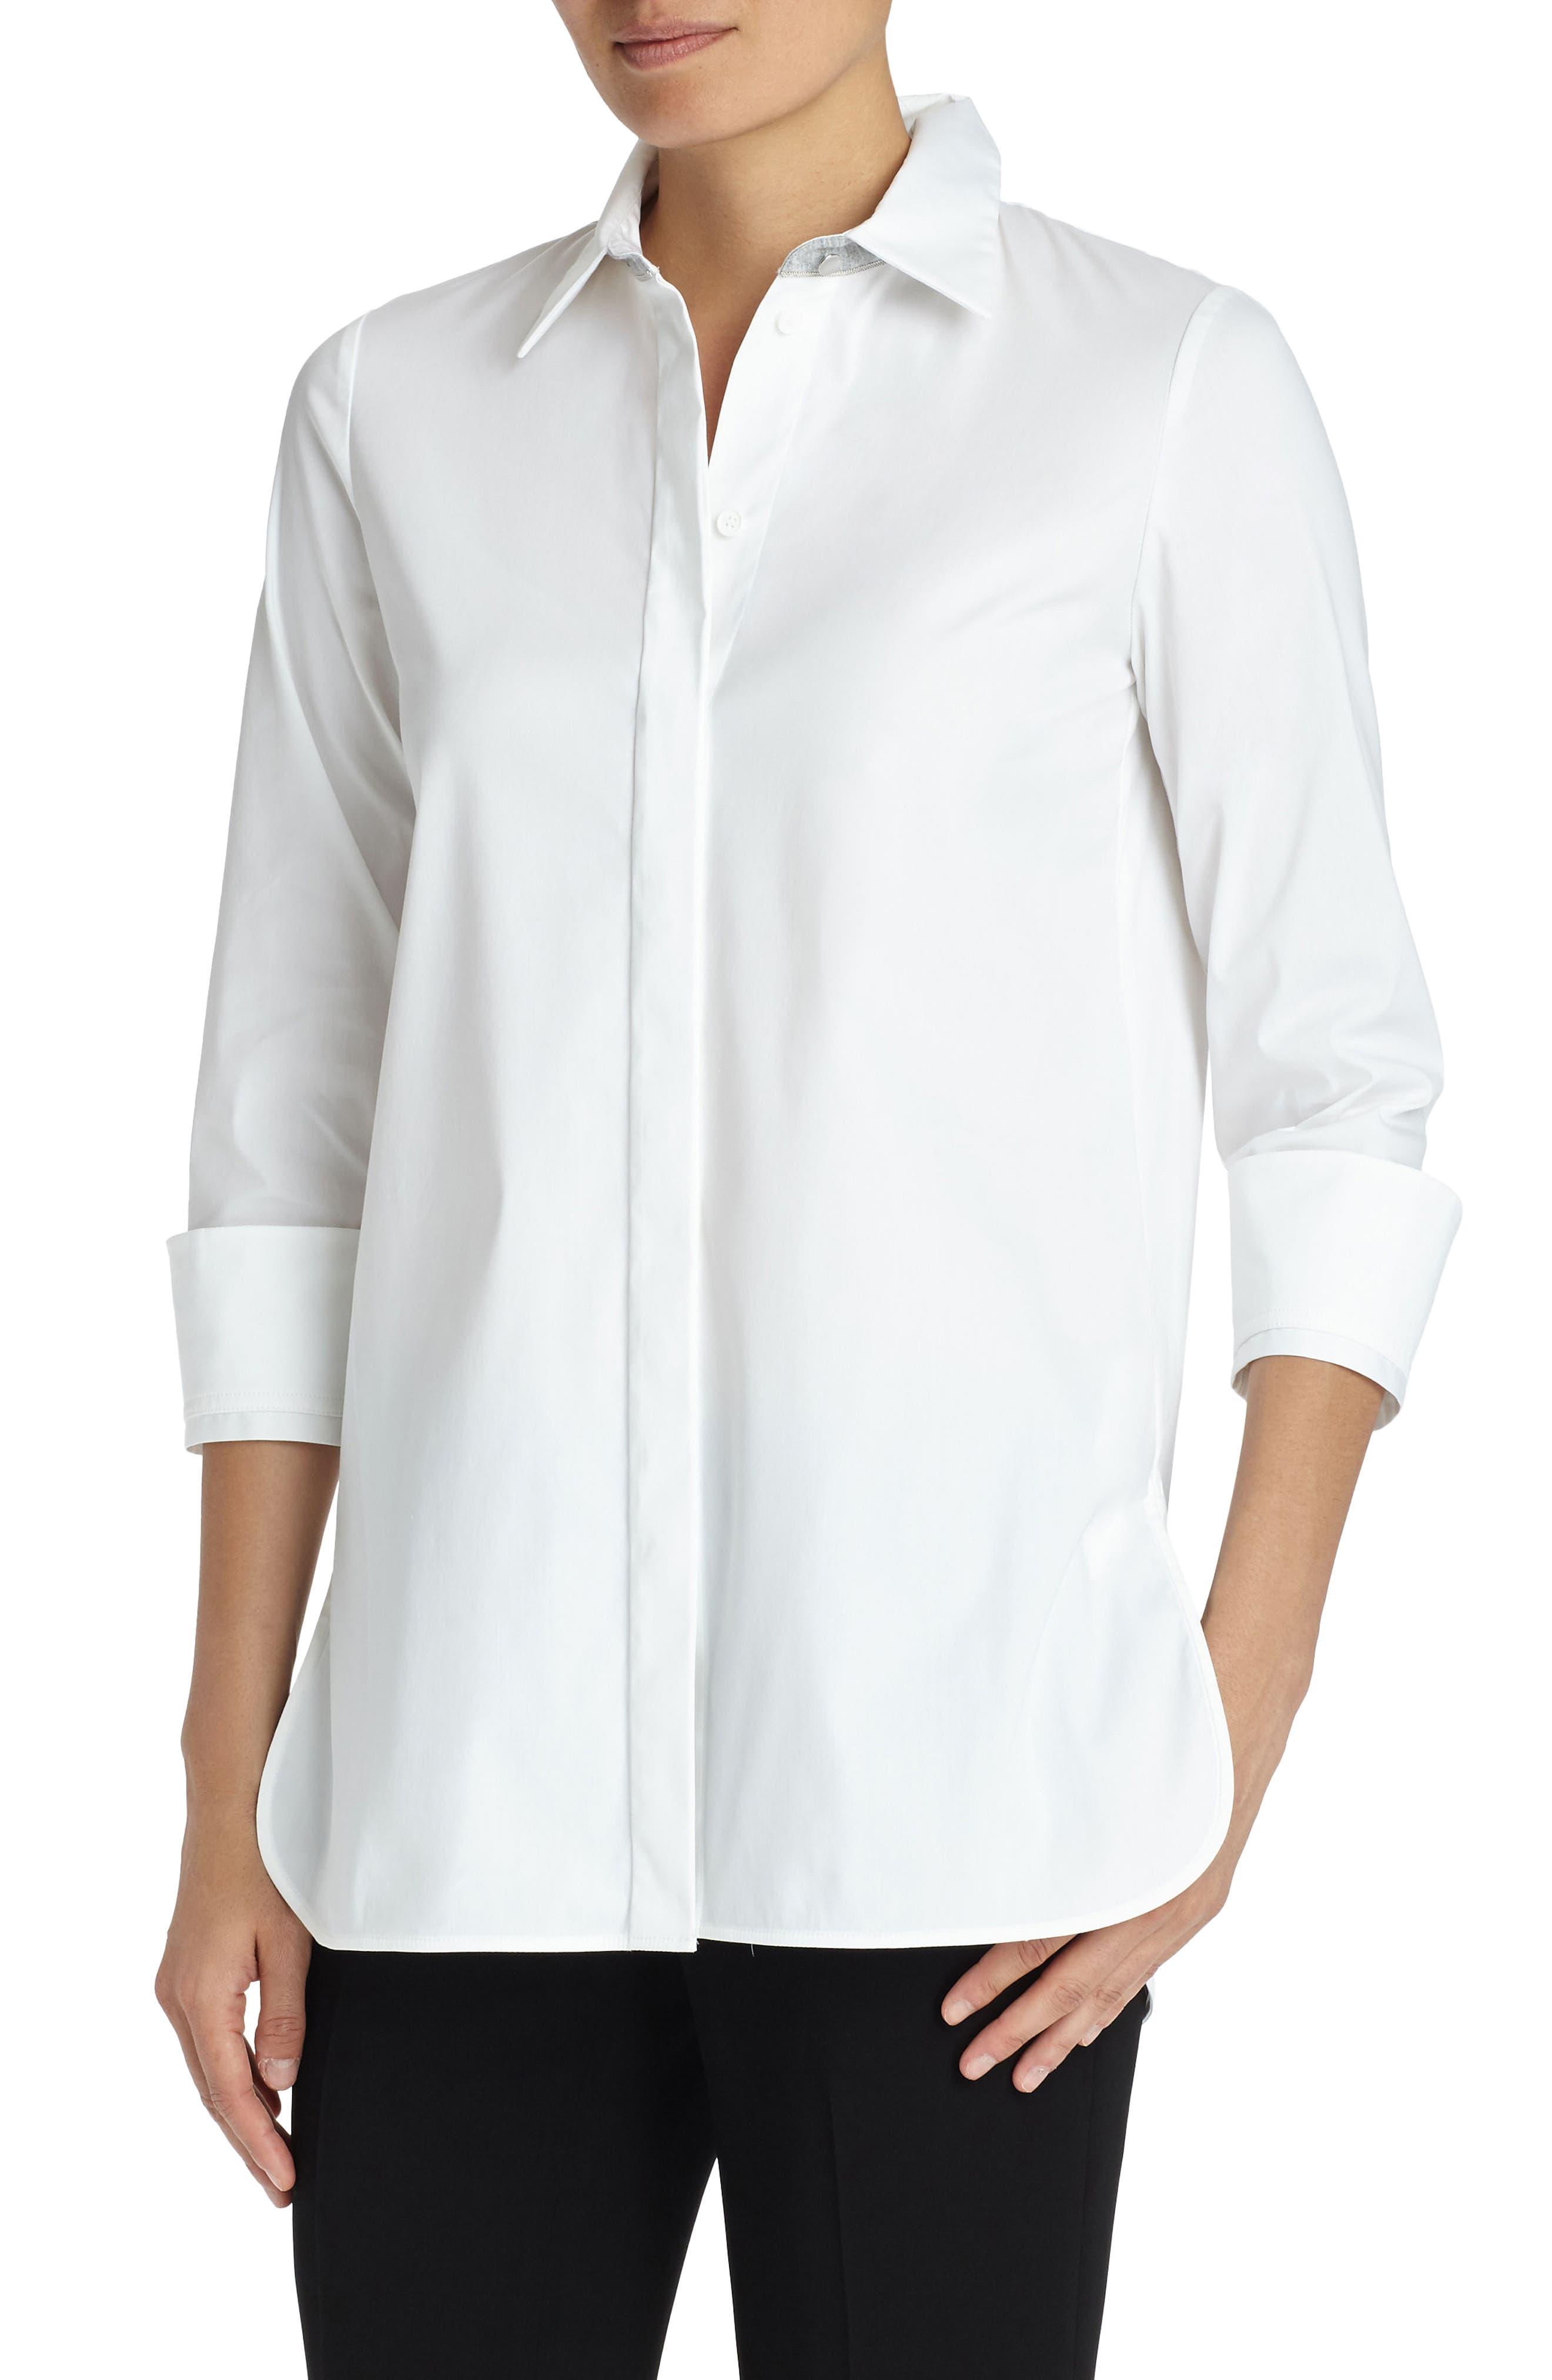 Augusta Stretch Cotton Shirt,                         Main,                         color, White